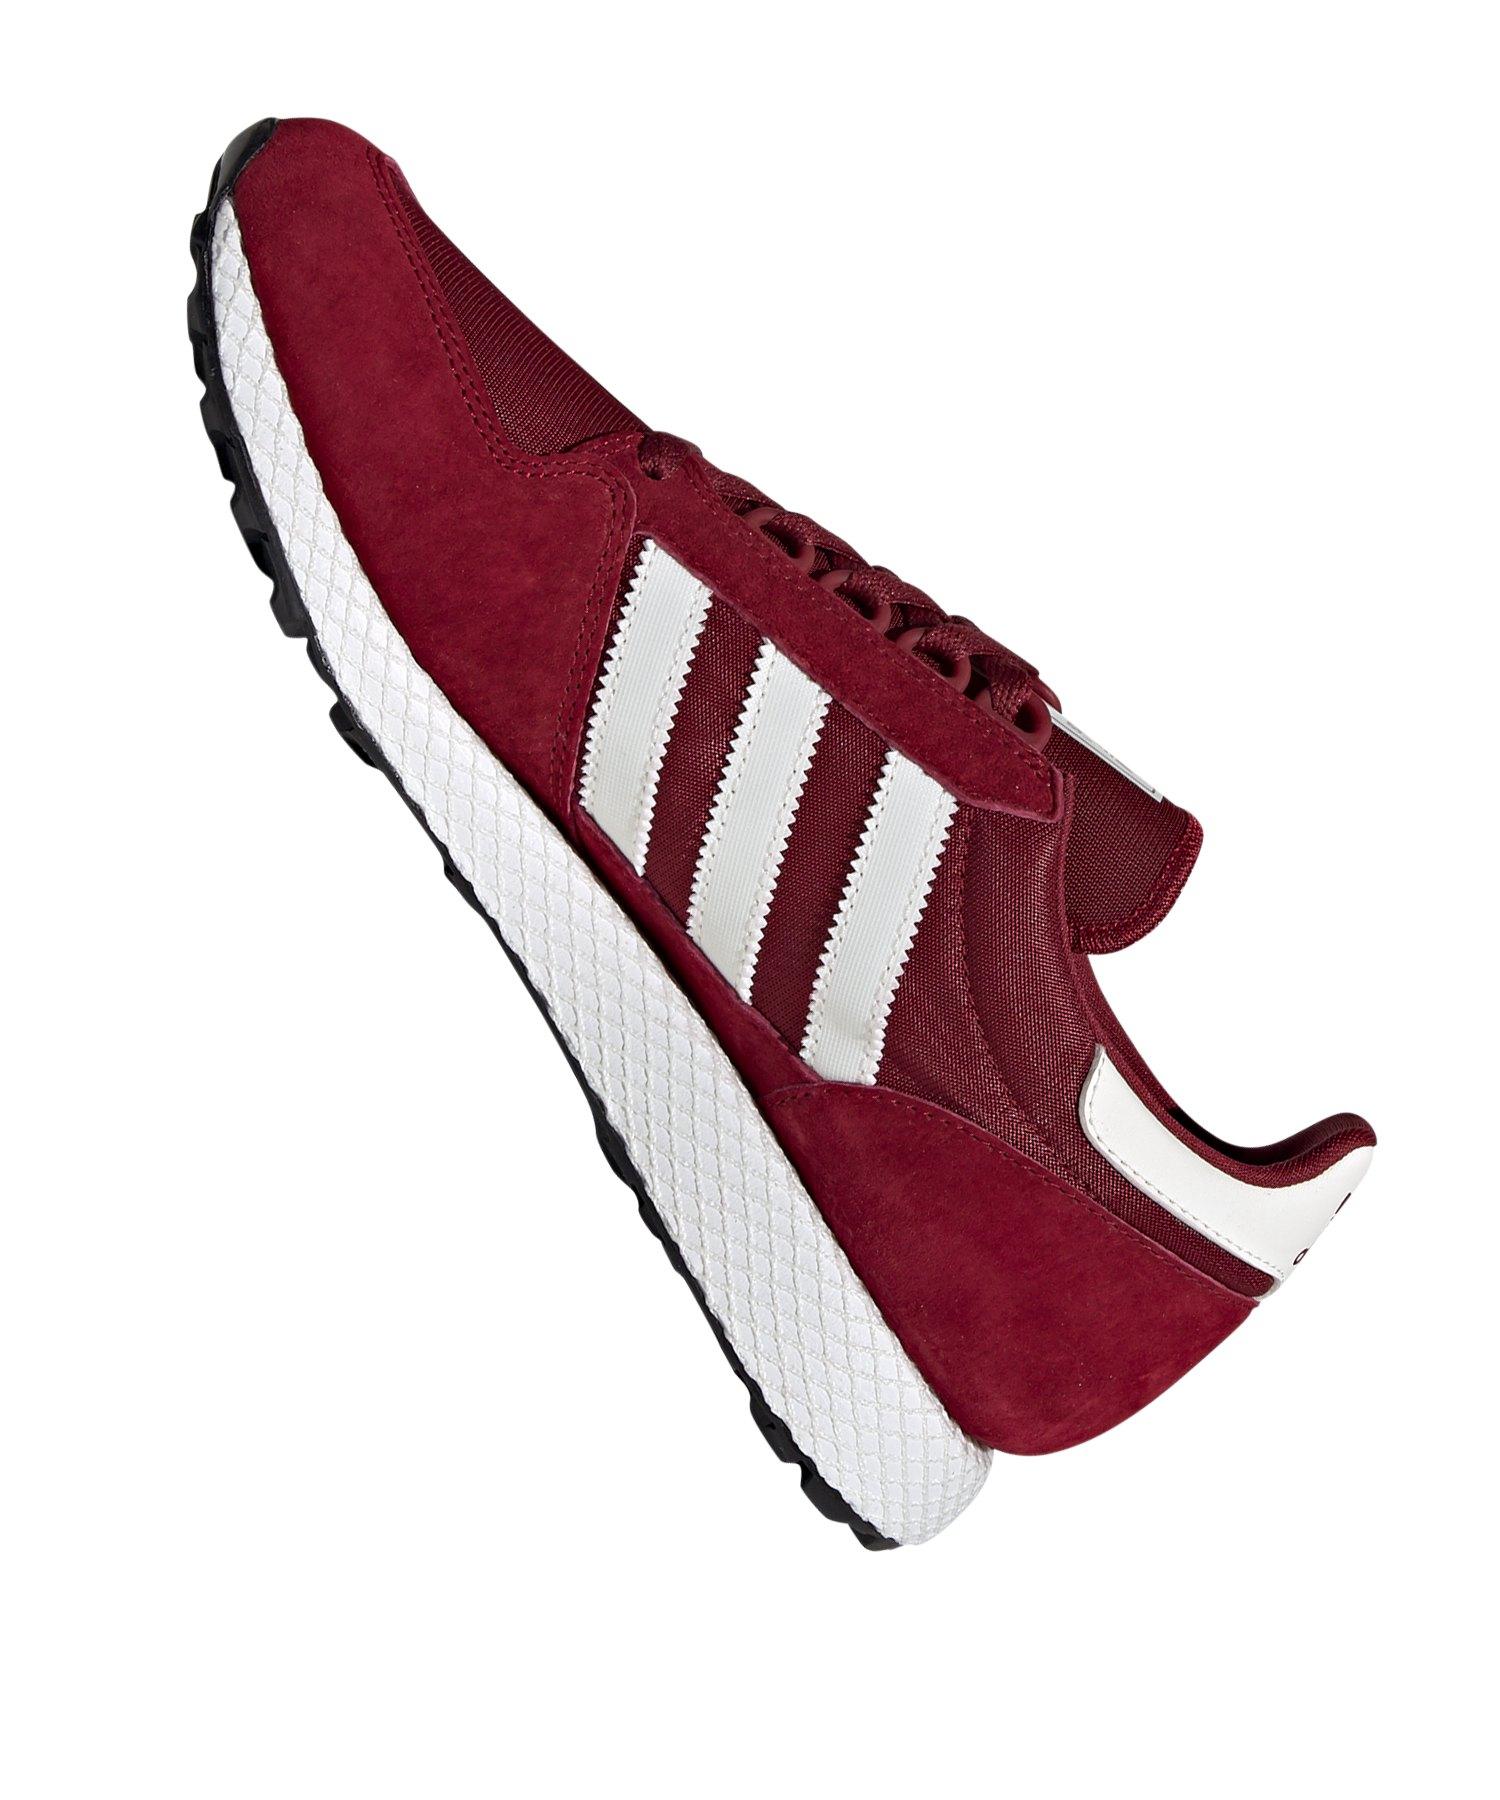 newest 77718 bba03 ... adidas Originals Forest Grove Sneaker Rot Weiss - rot ...